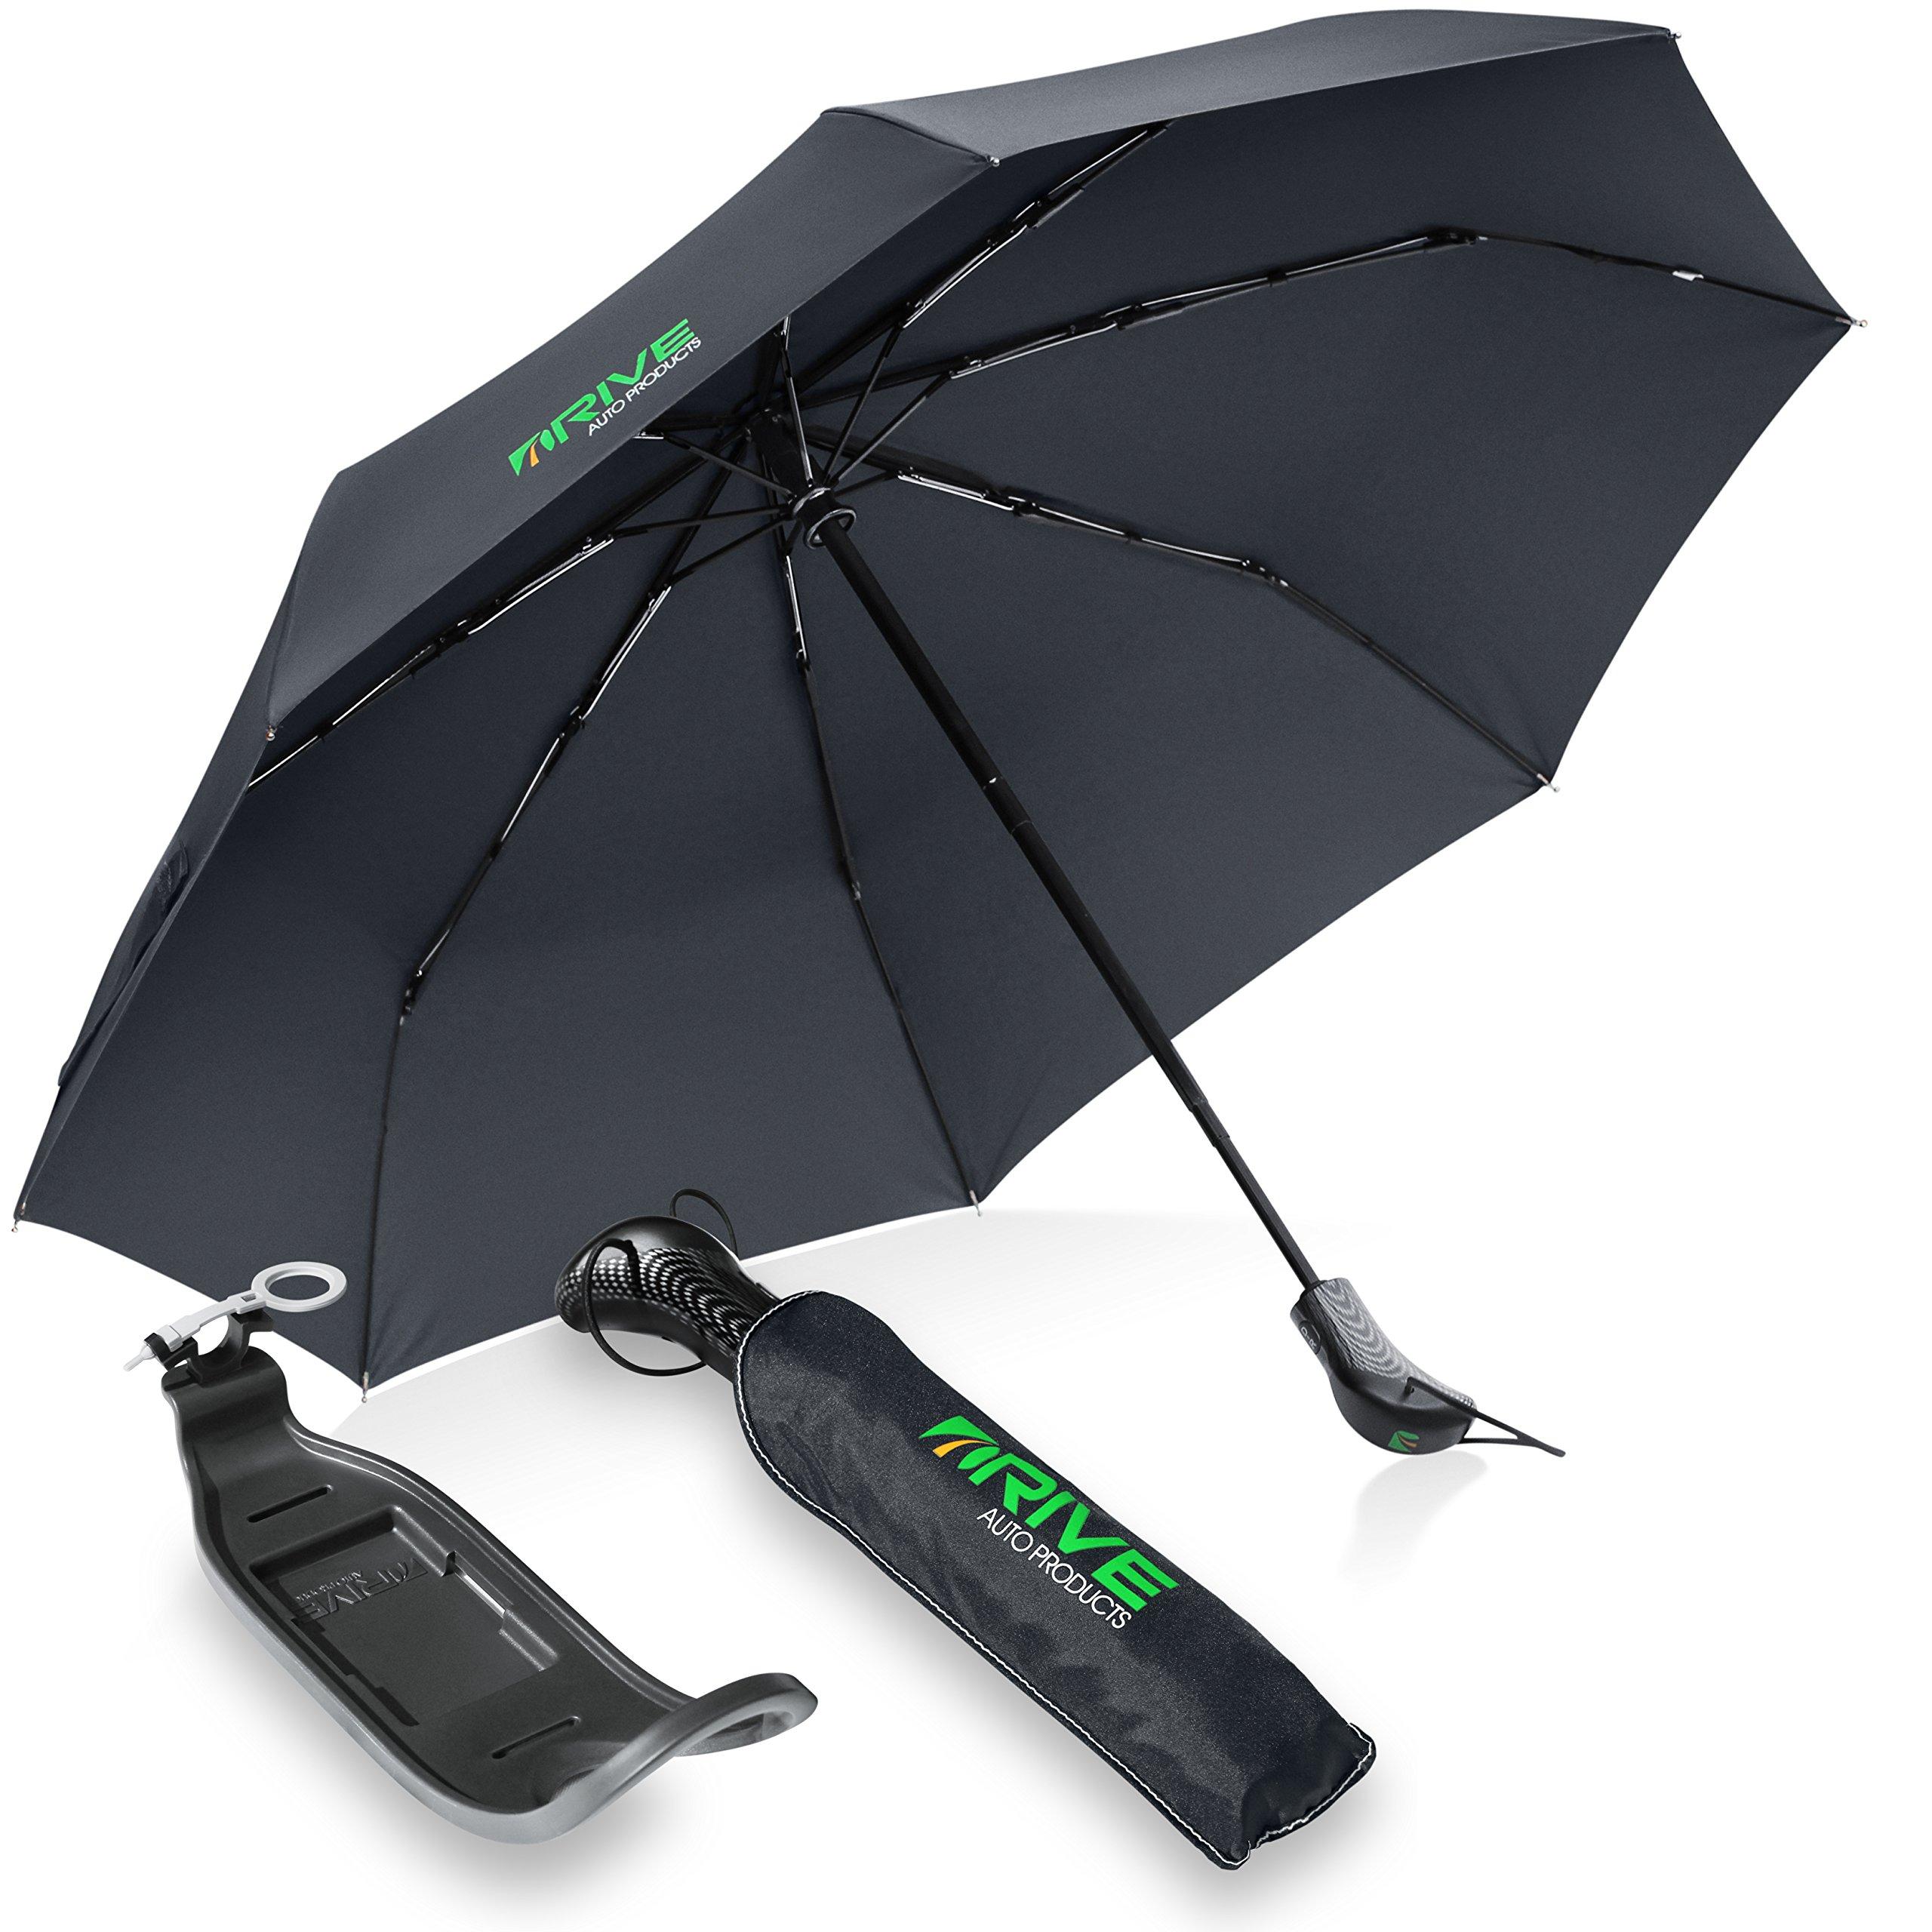 Drive Auto Products Umbrella Stroller